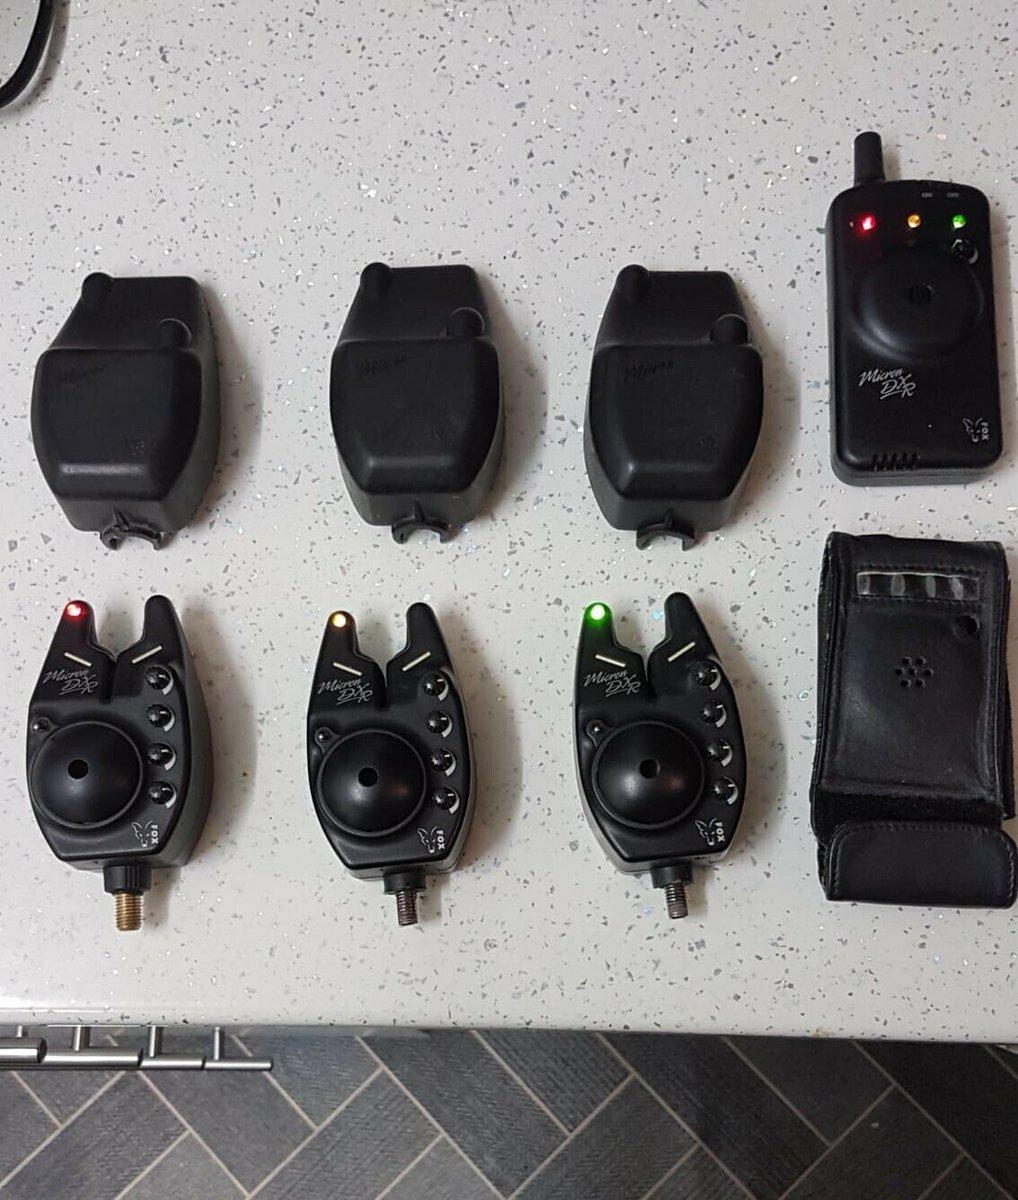 Ad - 3 x Fox DXR Micron bite alarms & <b>Receiver</b> On eBay here -->> https://t.co/gQ5Uj